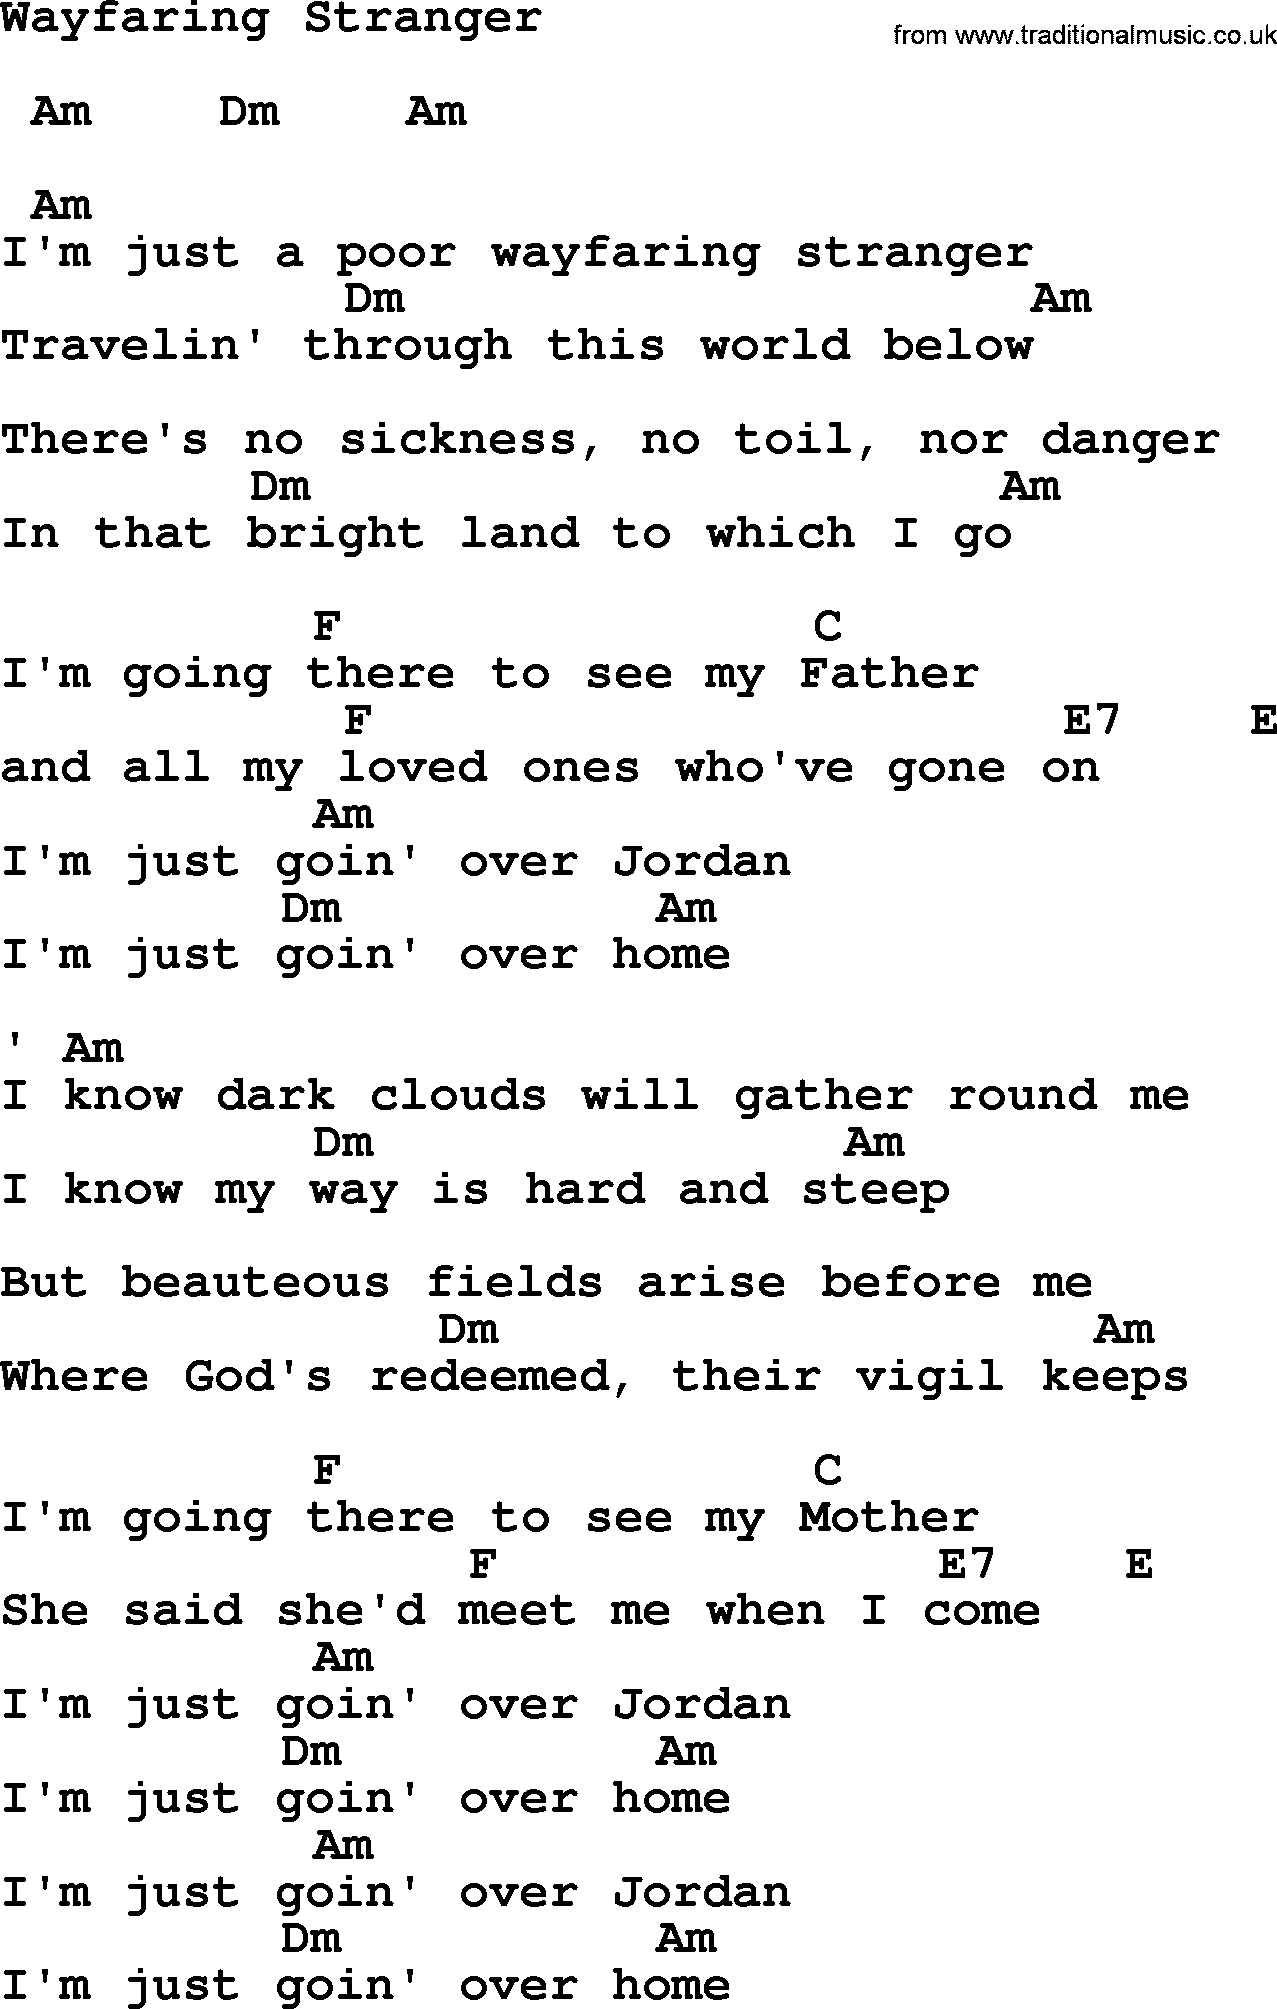 Johnny Cash Song Wayfaring Stranger Lyrics And Chords Songs In